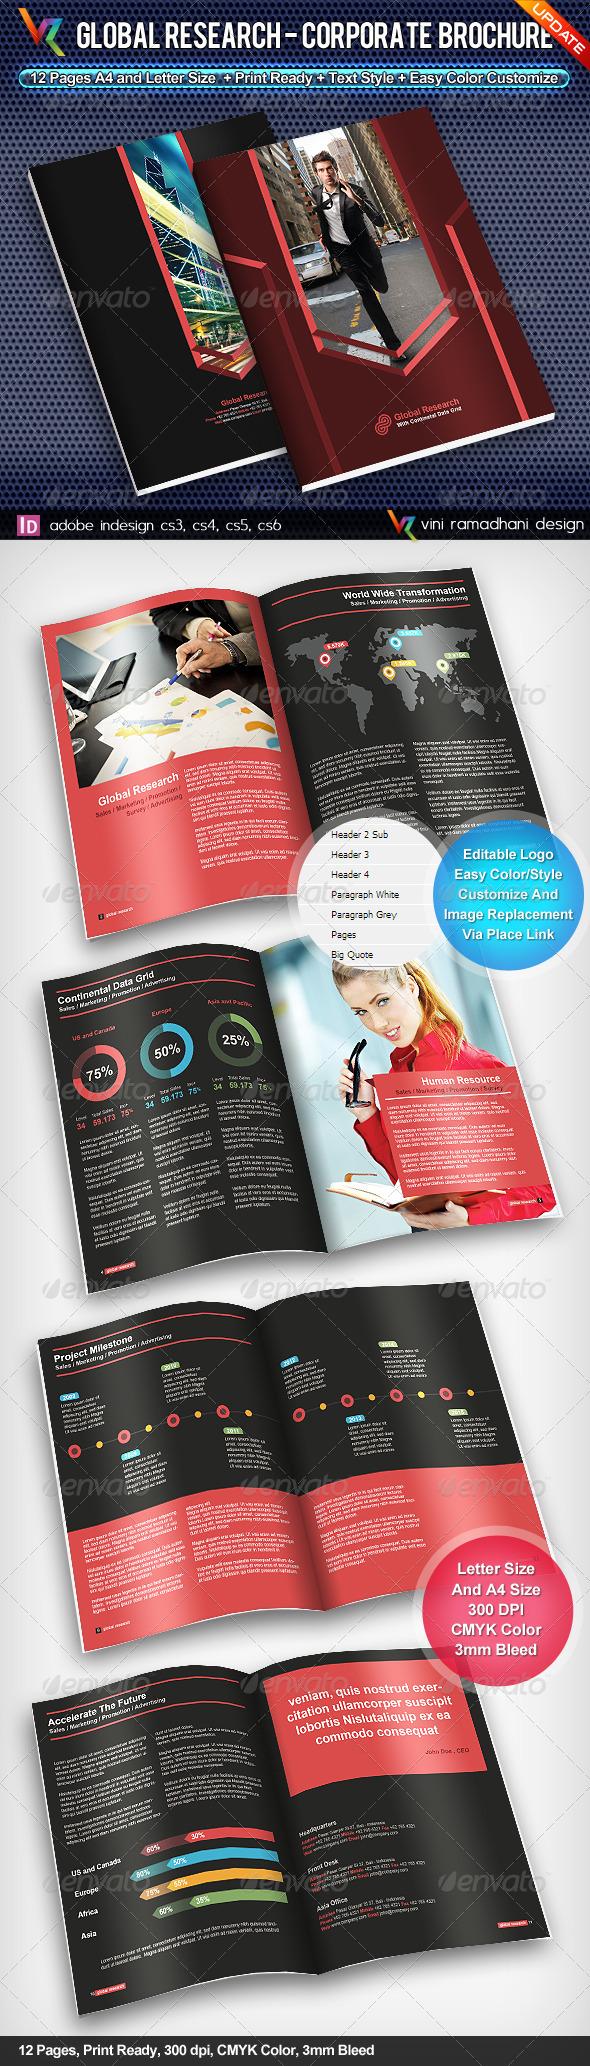 Global Research Corporate Brochure - Corporate Brochures